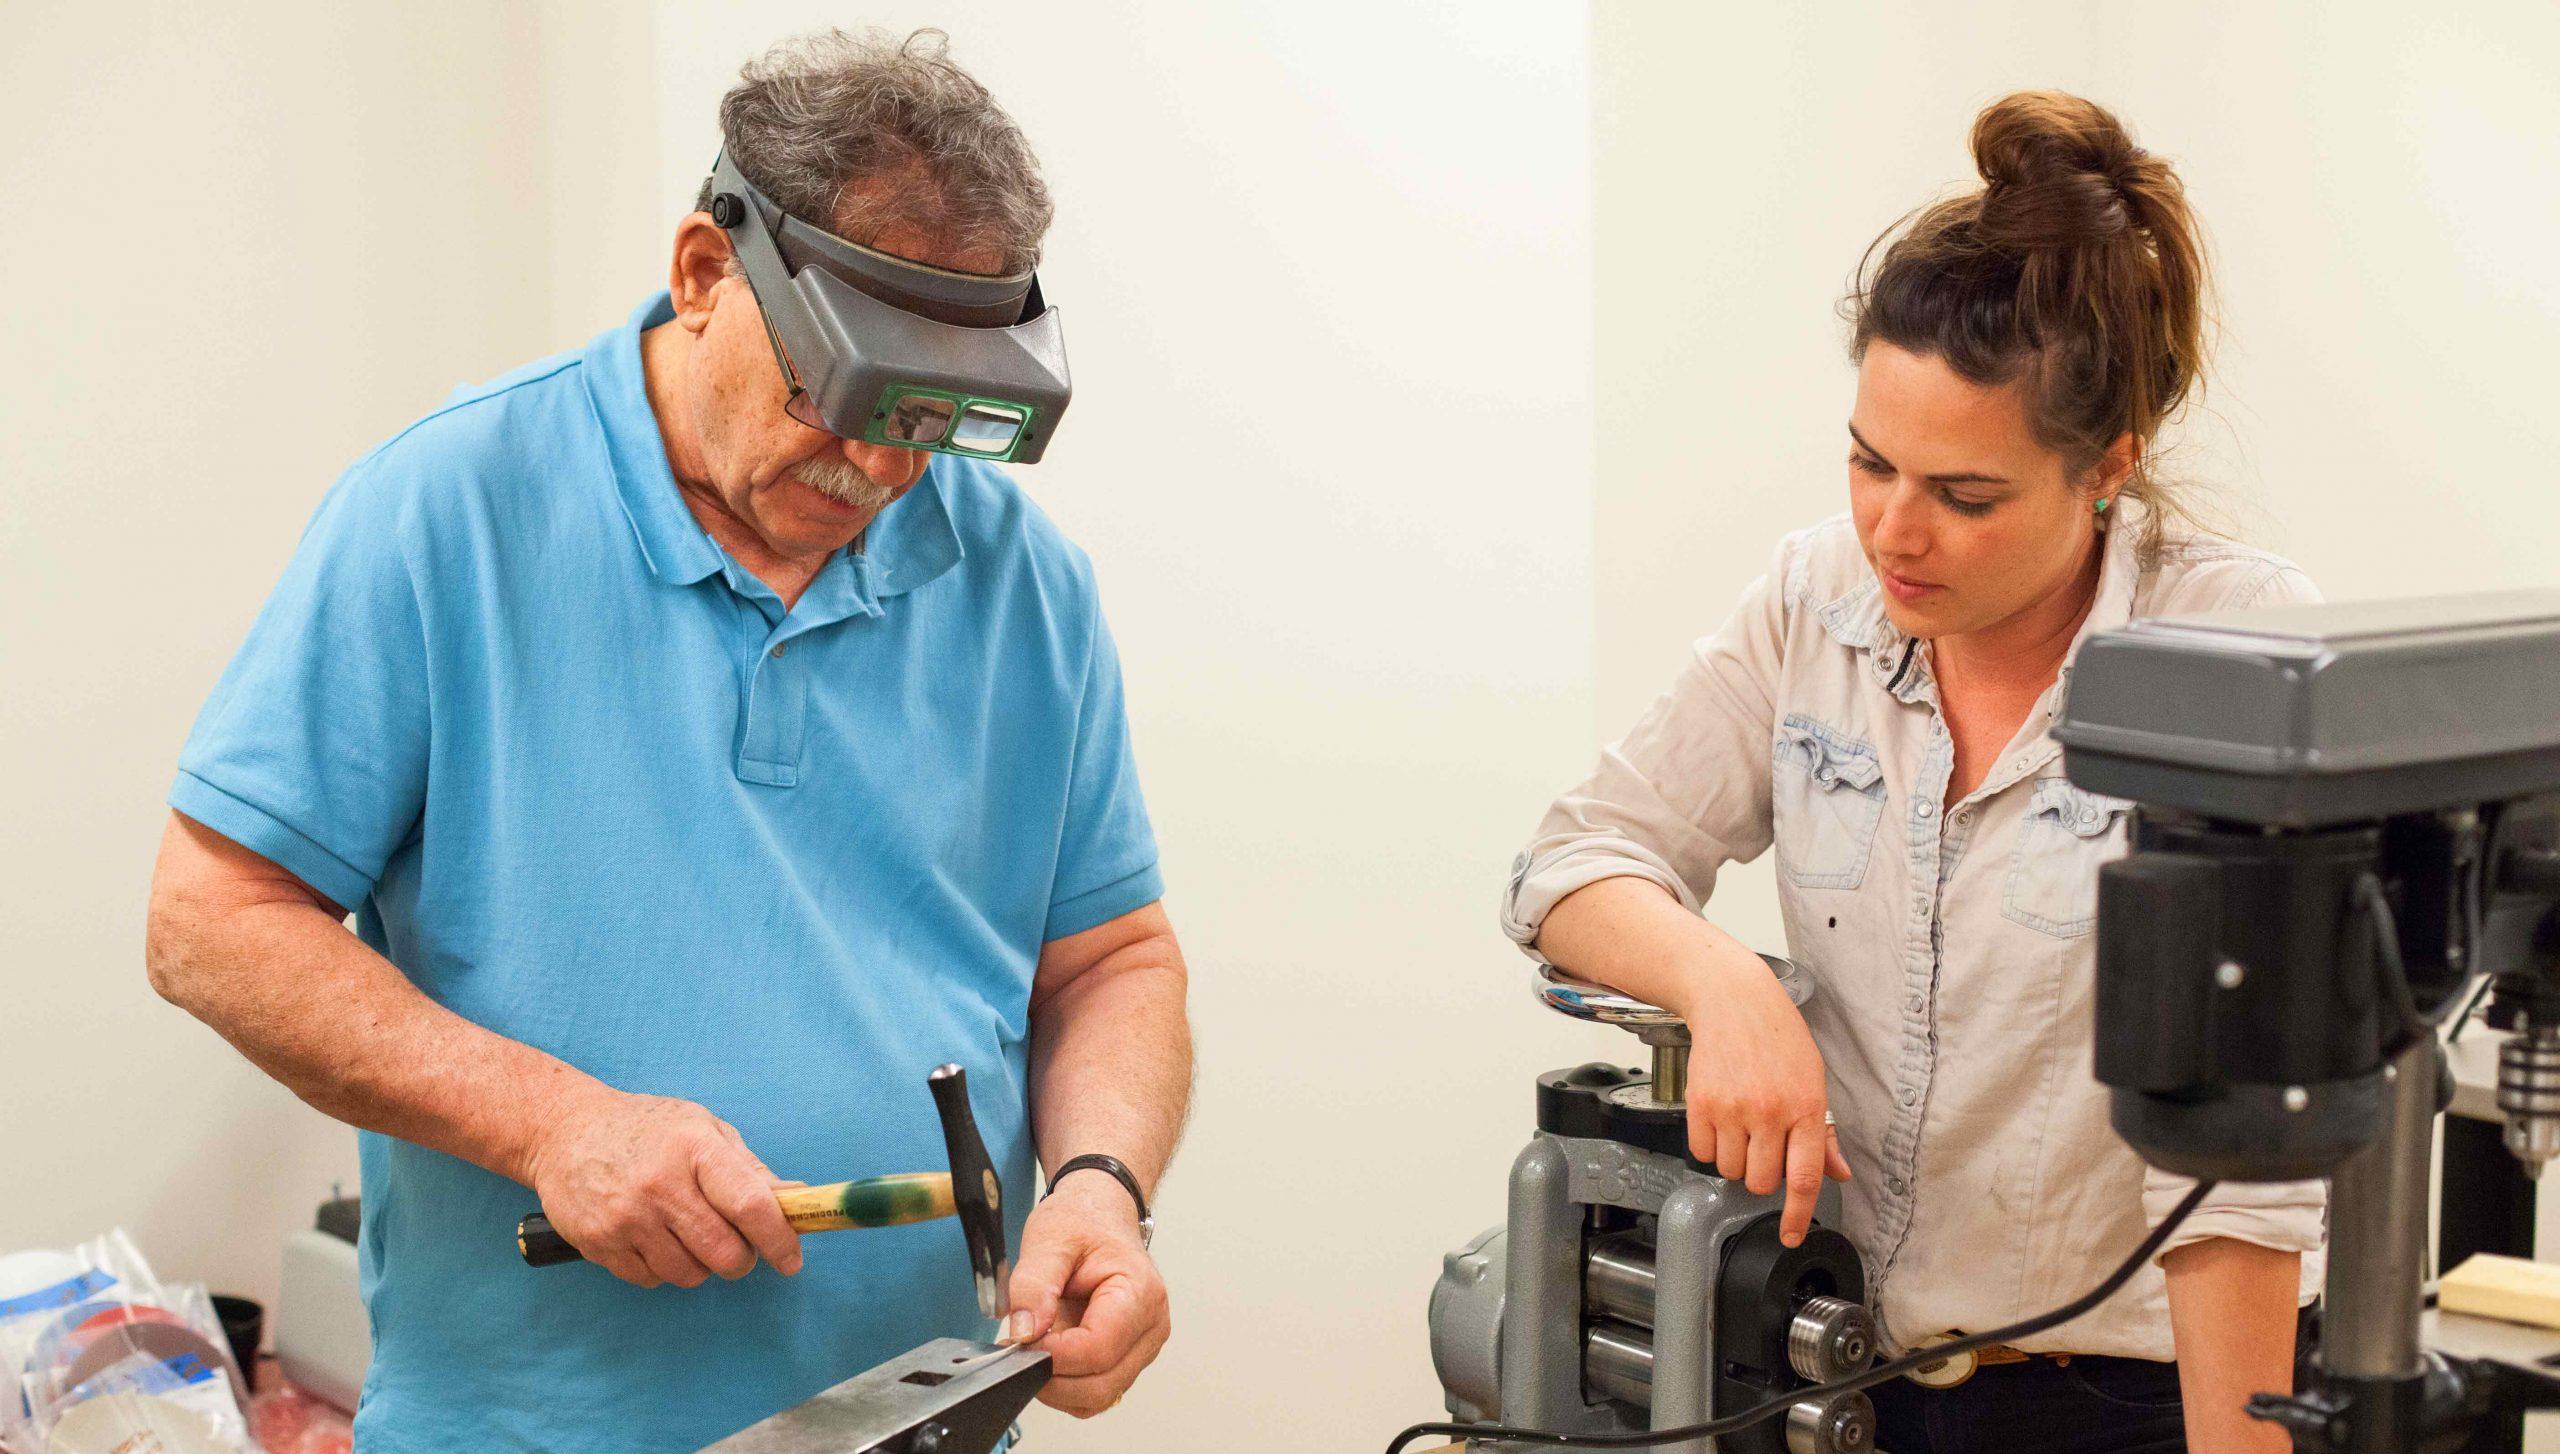 Randy Burns and Hilary Muramoto working in the metalsmithing workspace